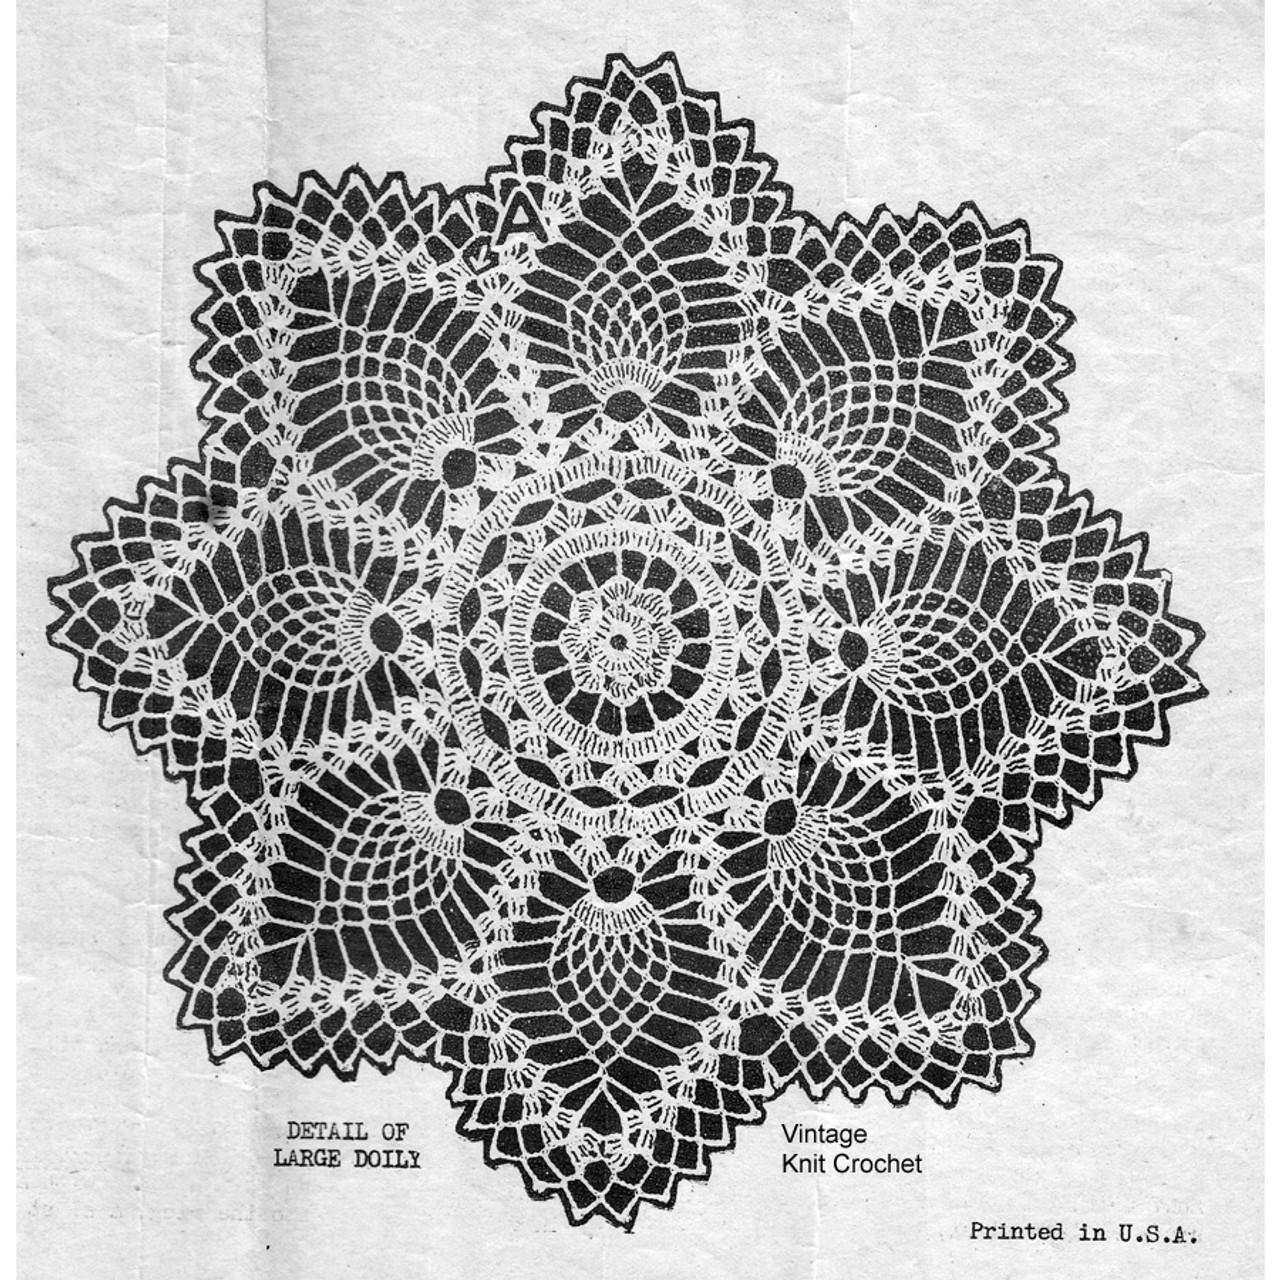 Pineapple Doily pattern Stitch Detail, Design 7389